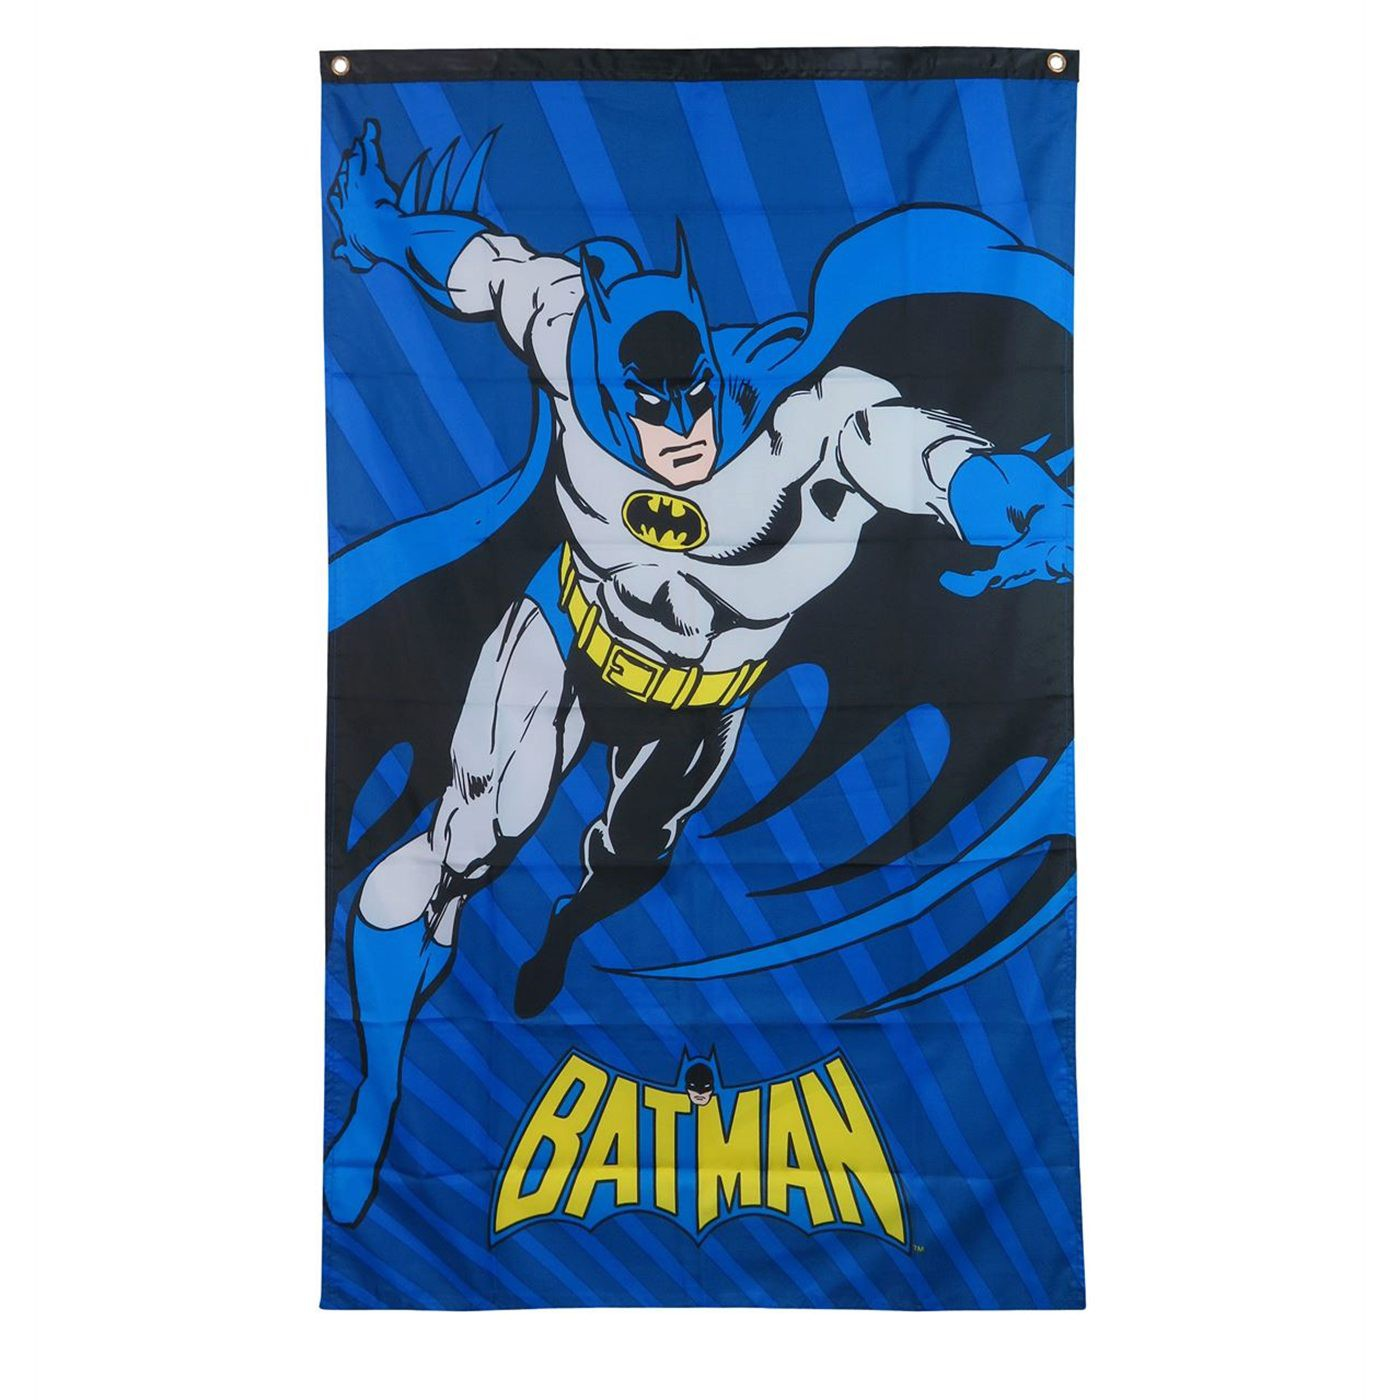 Batman Charging Fabric Banner